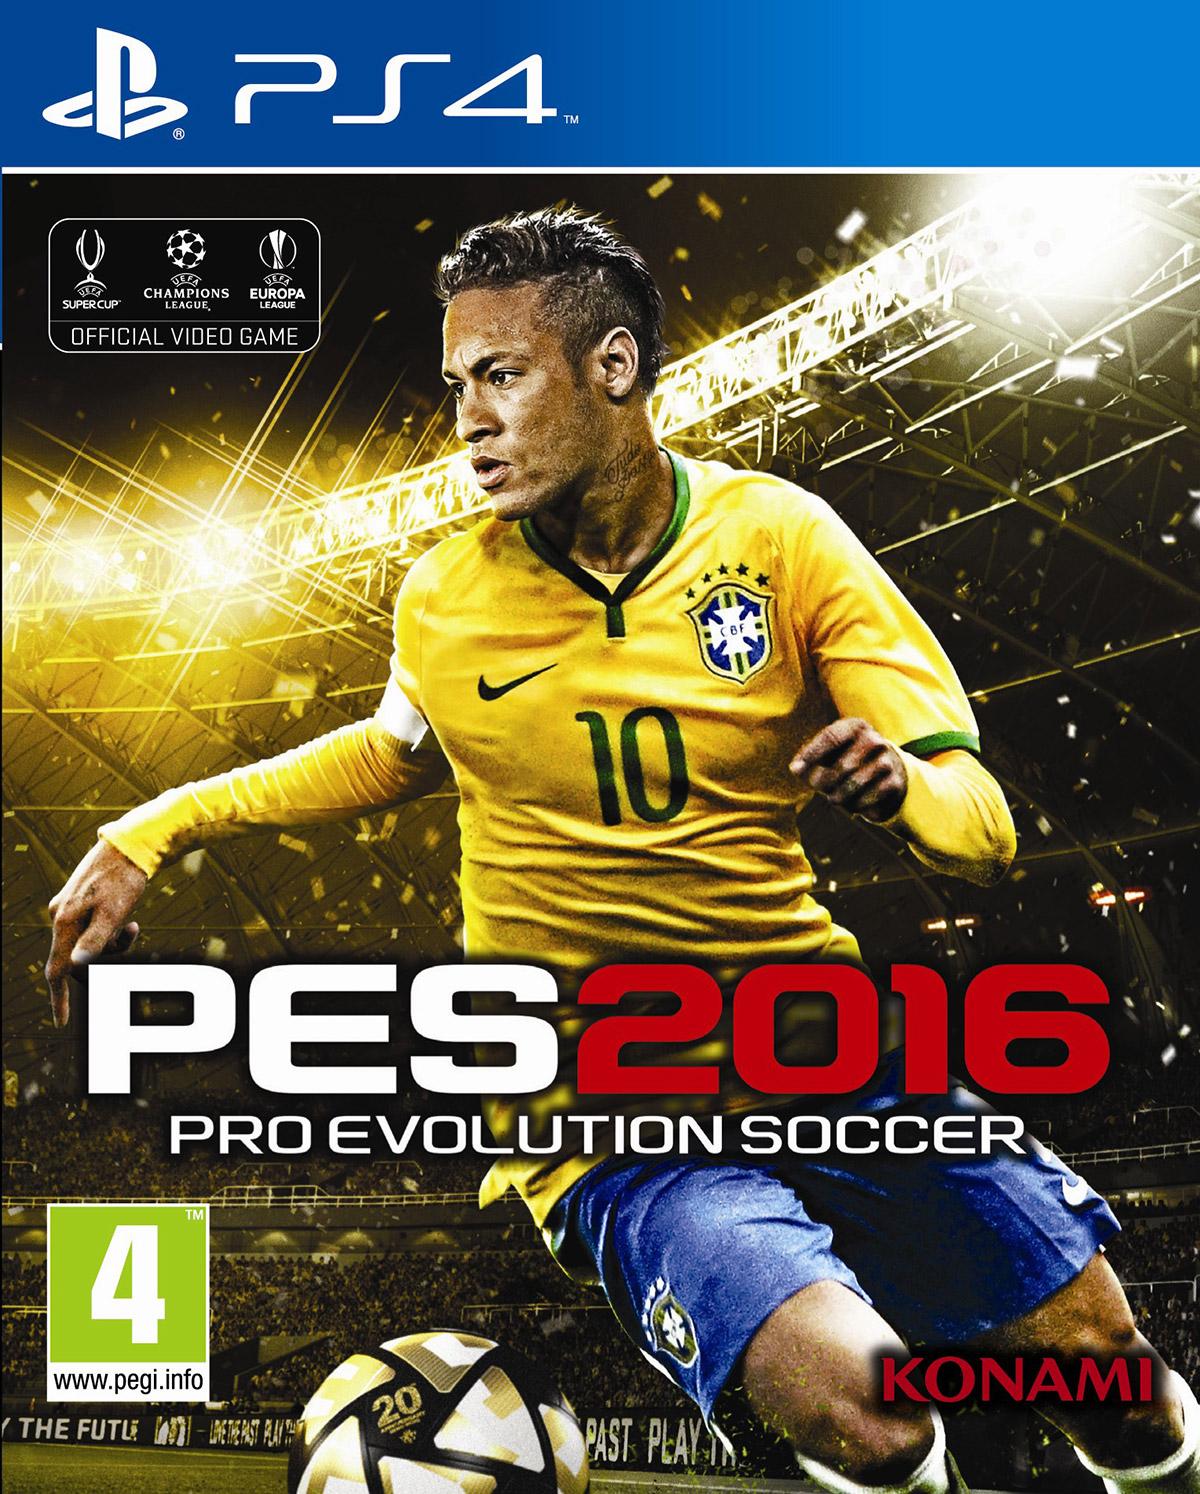 Pro Evolution Soccer 2016 | Videogame soundtracks Wiki